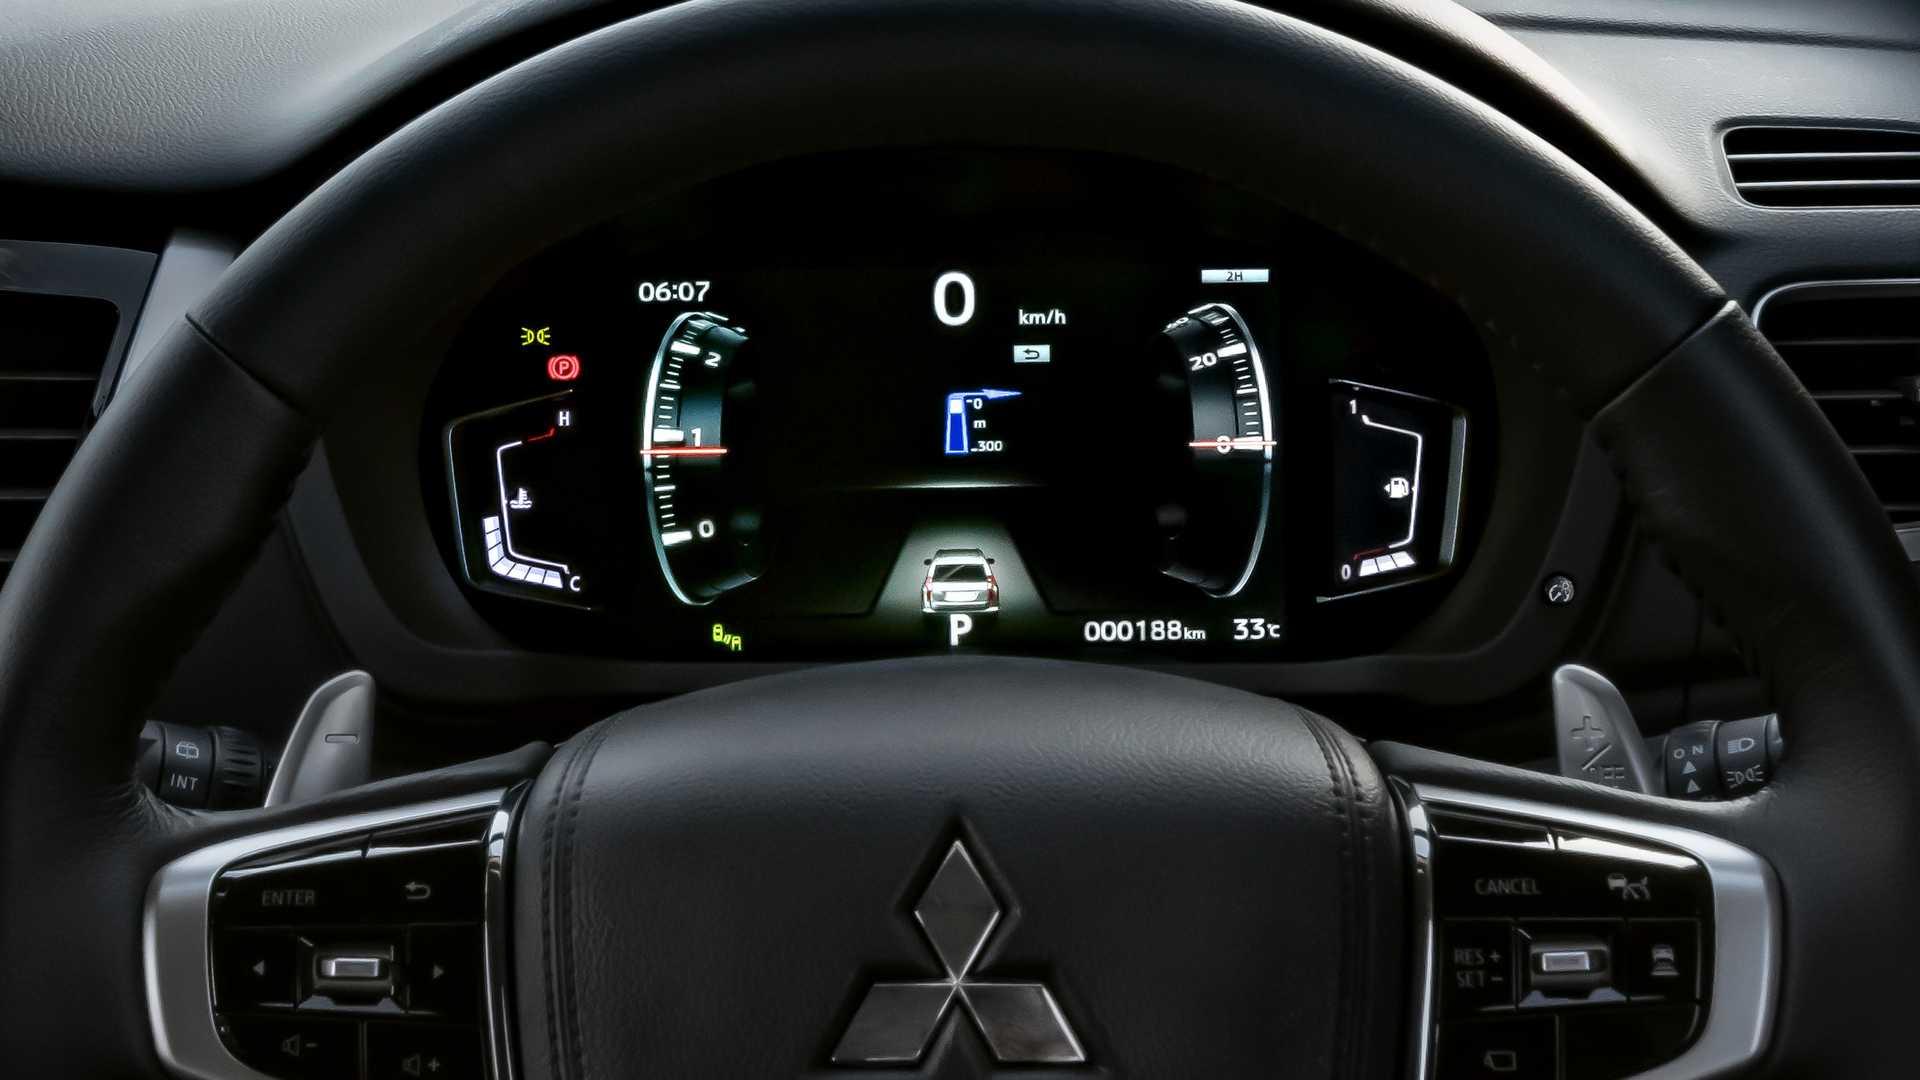 2020_Mitsubishi_Pajero_Sport_facelift_0033